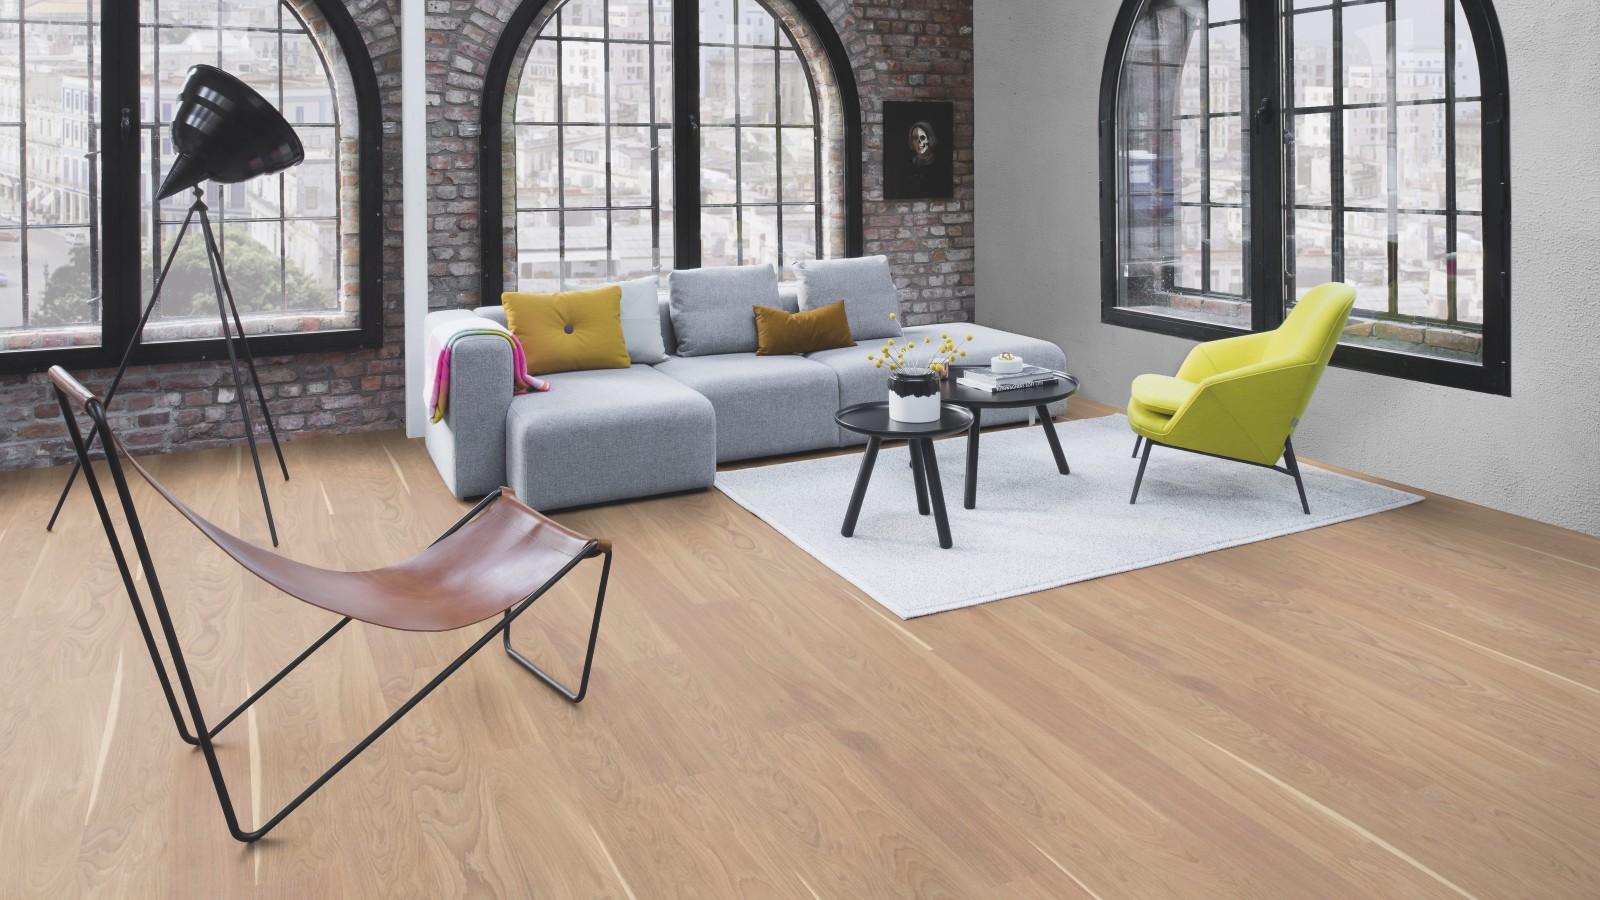 boen parkett landhausdiele finesse 10 5 mm eiche natur wei live matt. Black Bedroom Furniture Sets. Home Design Ideas